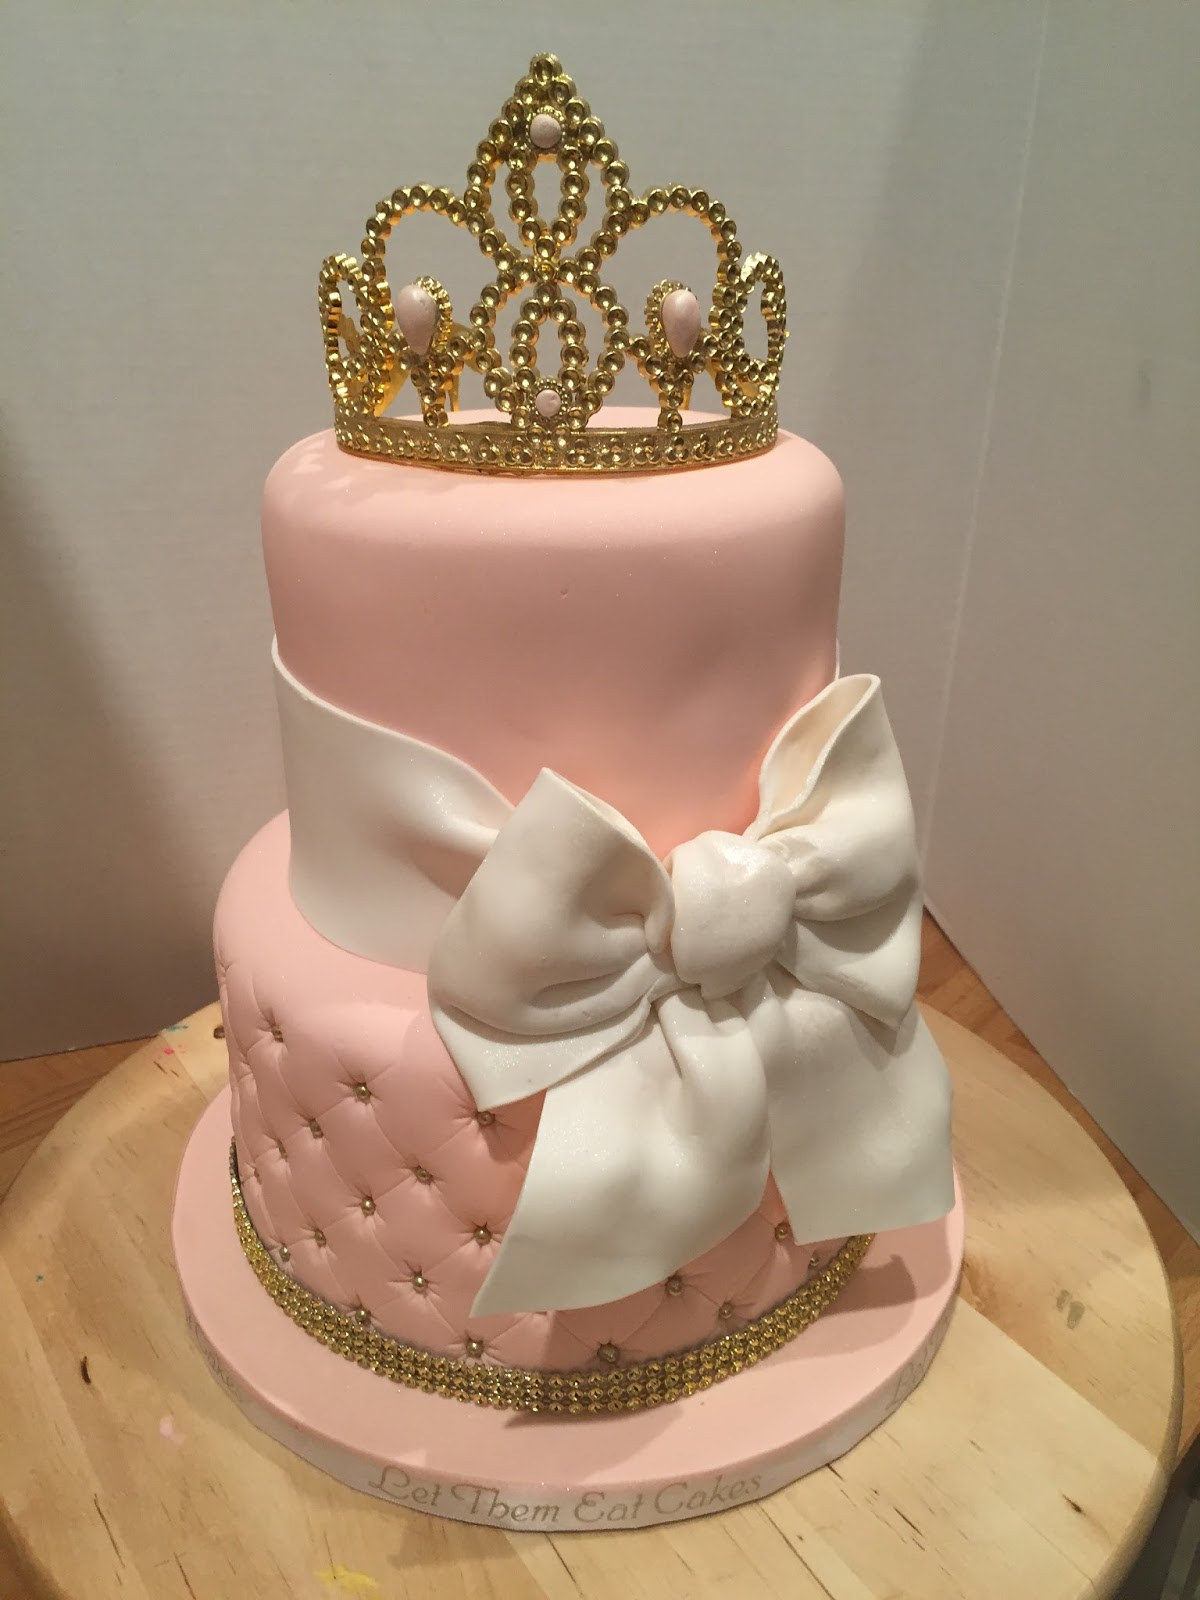 Jewelry Themed Birthday Cakes